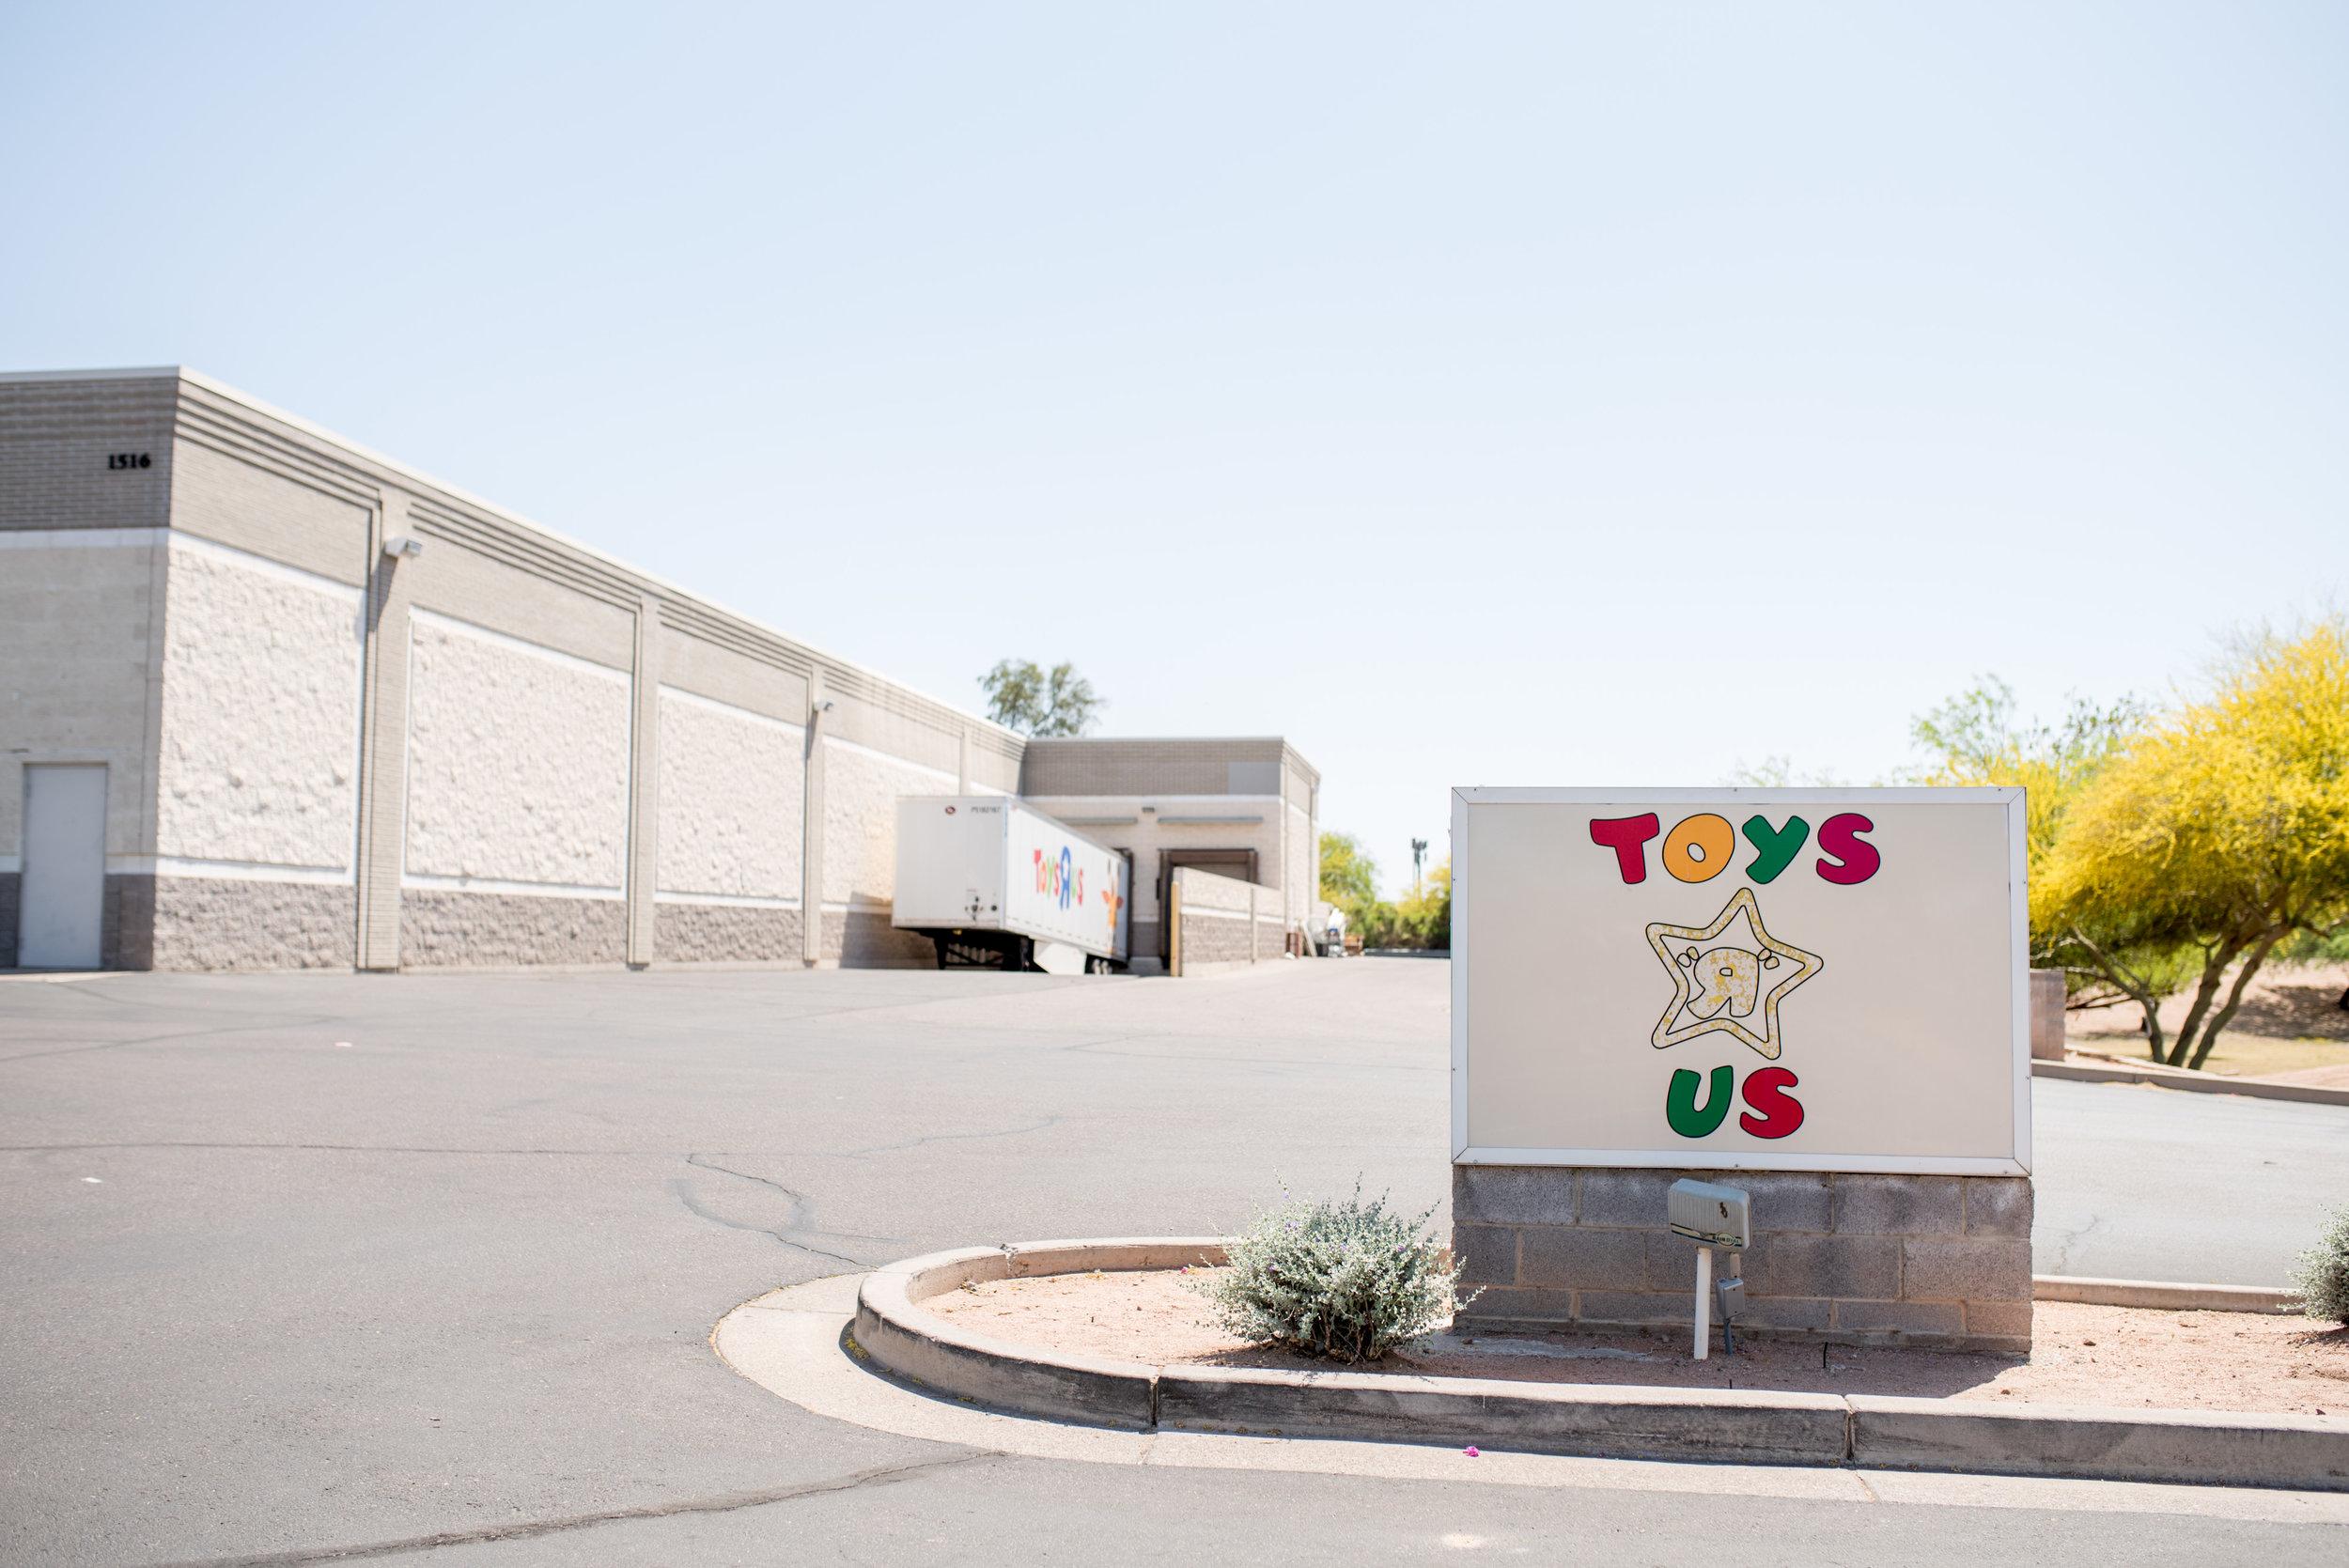 YoysRUs-1.jpg